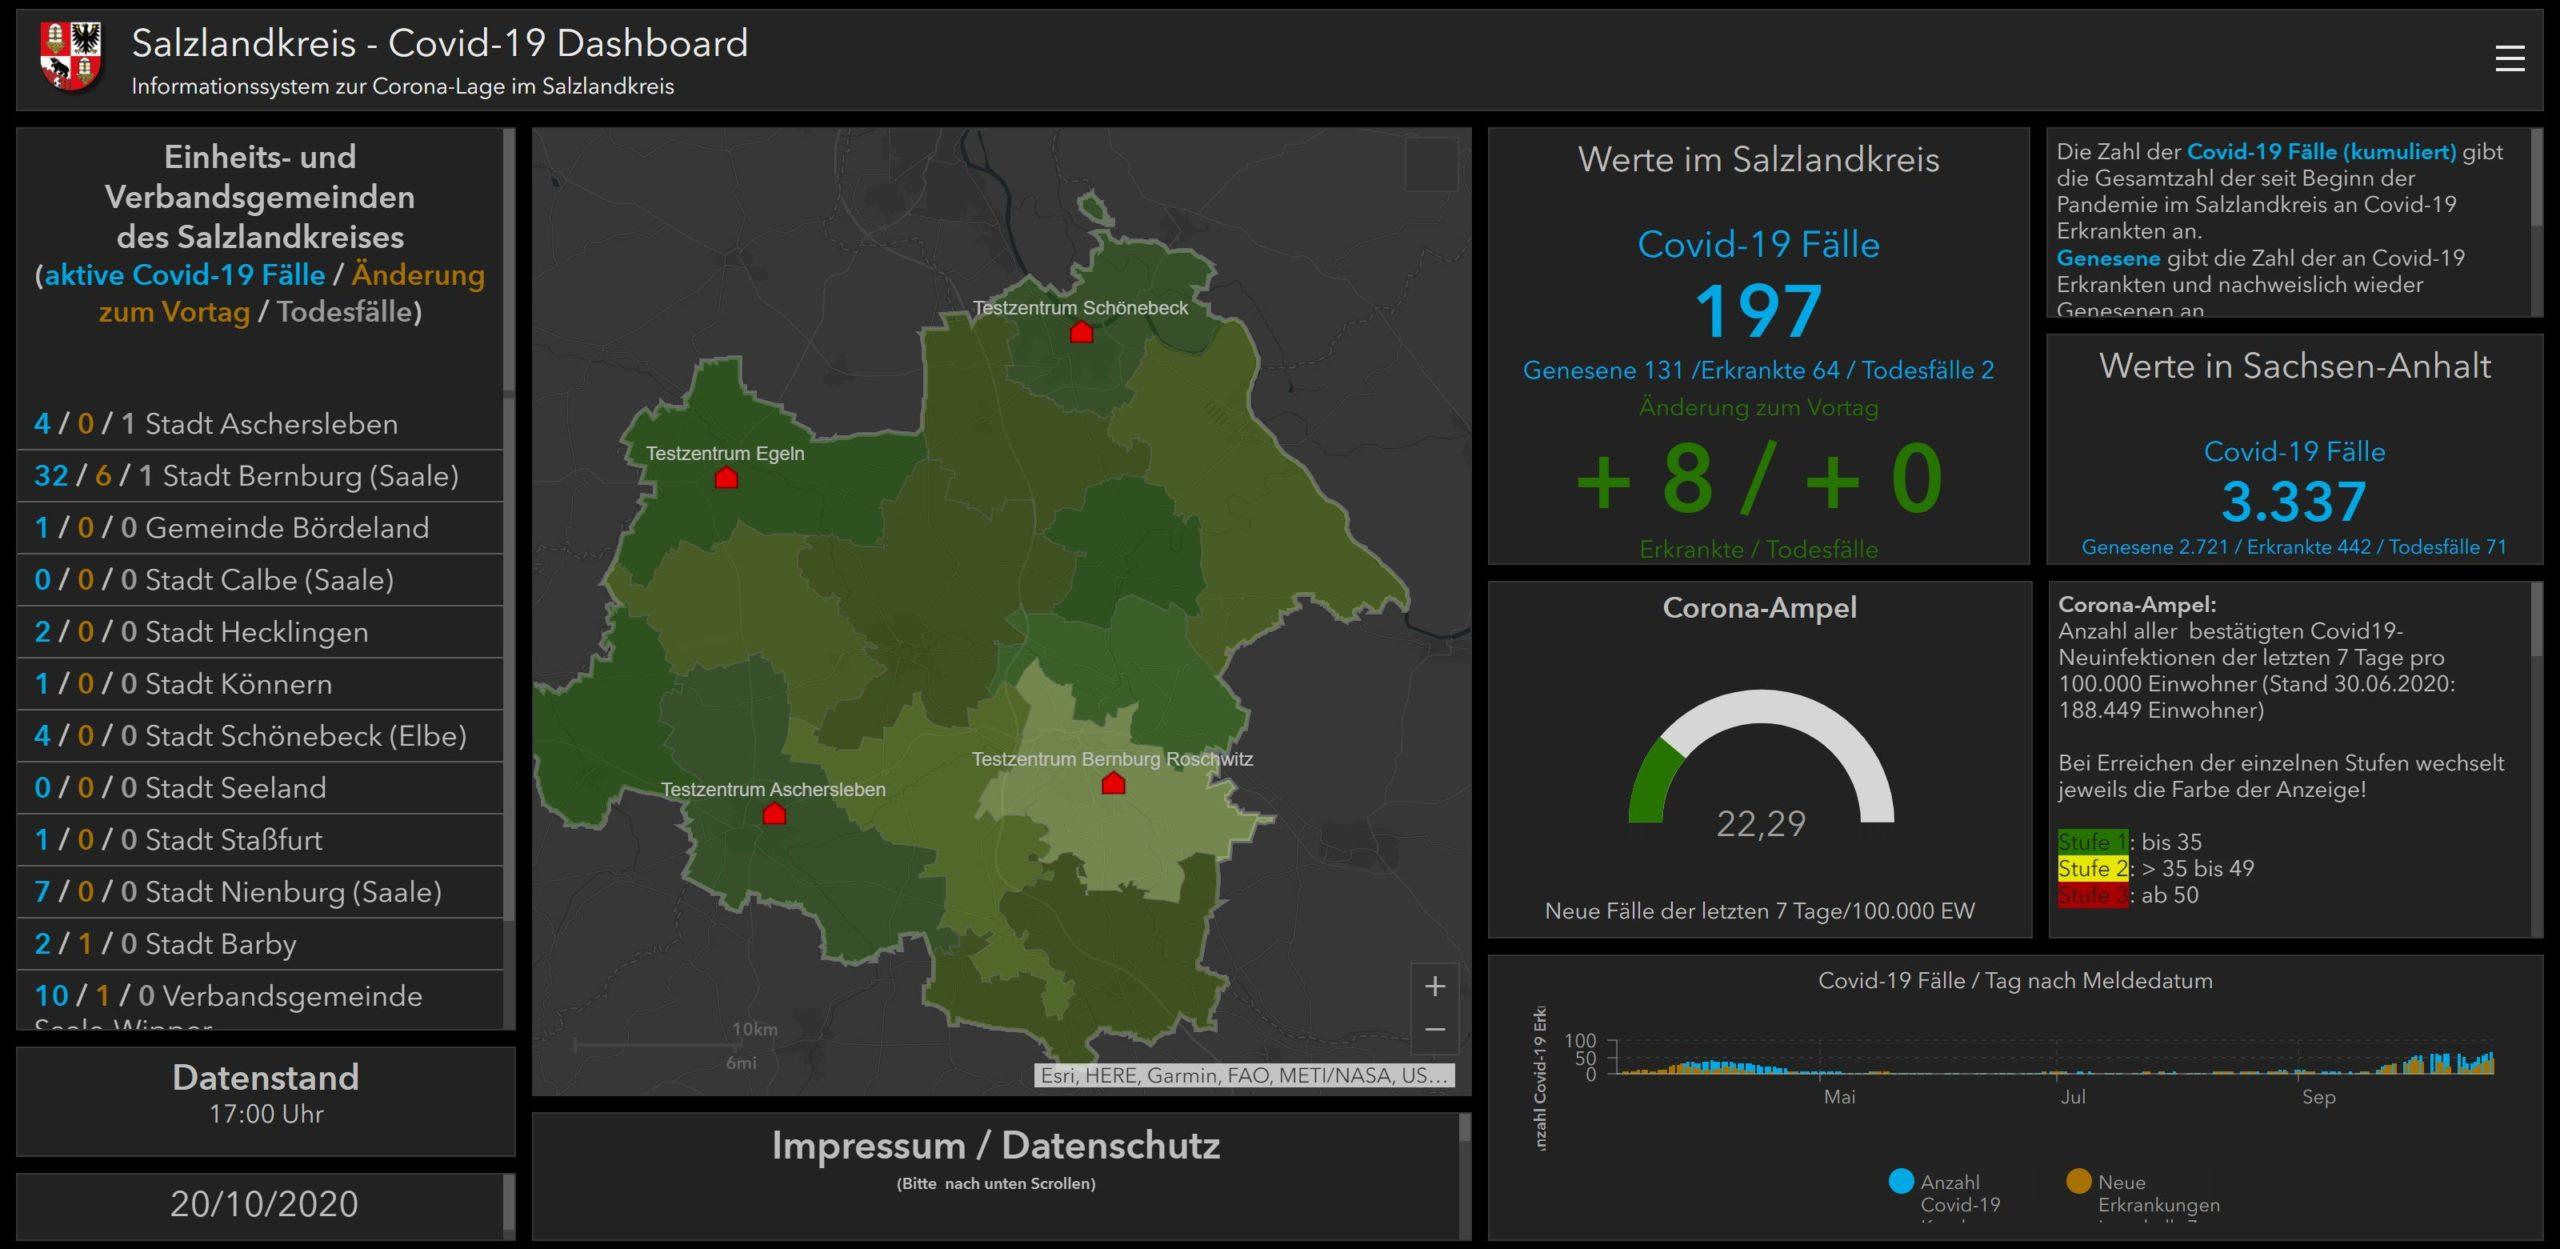 Covid-19 Dashboard Salzlandkreis